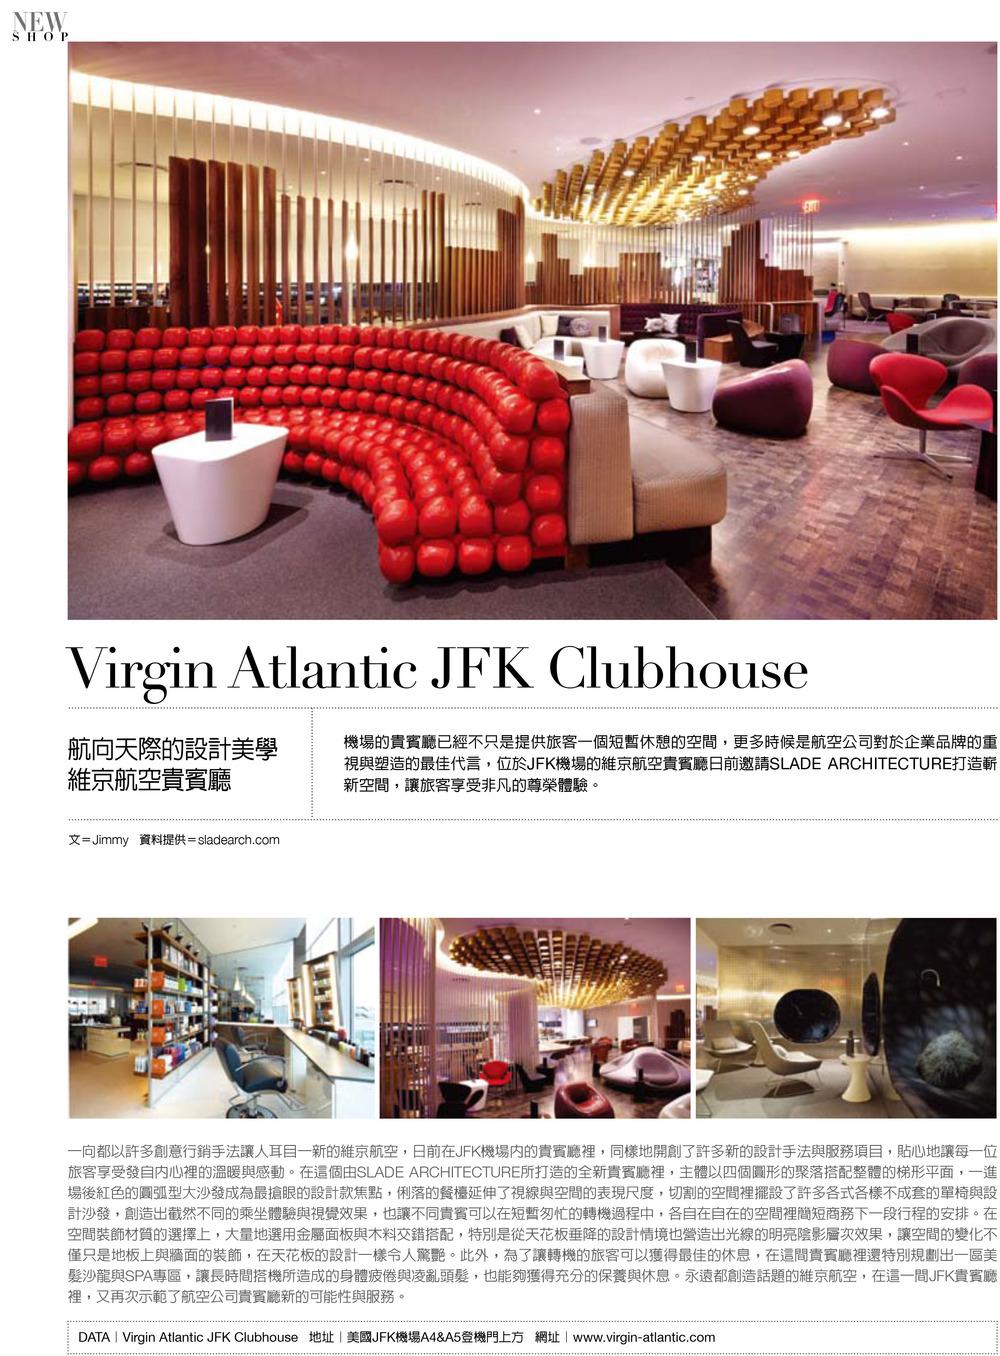 New Shop-維京航空.jpg